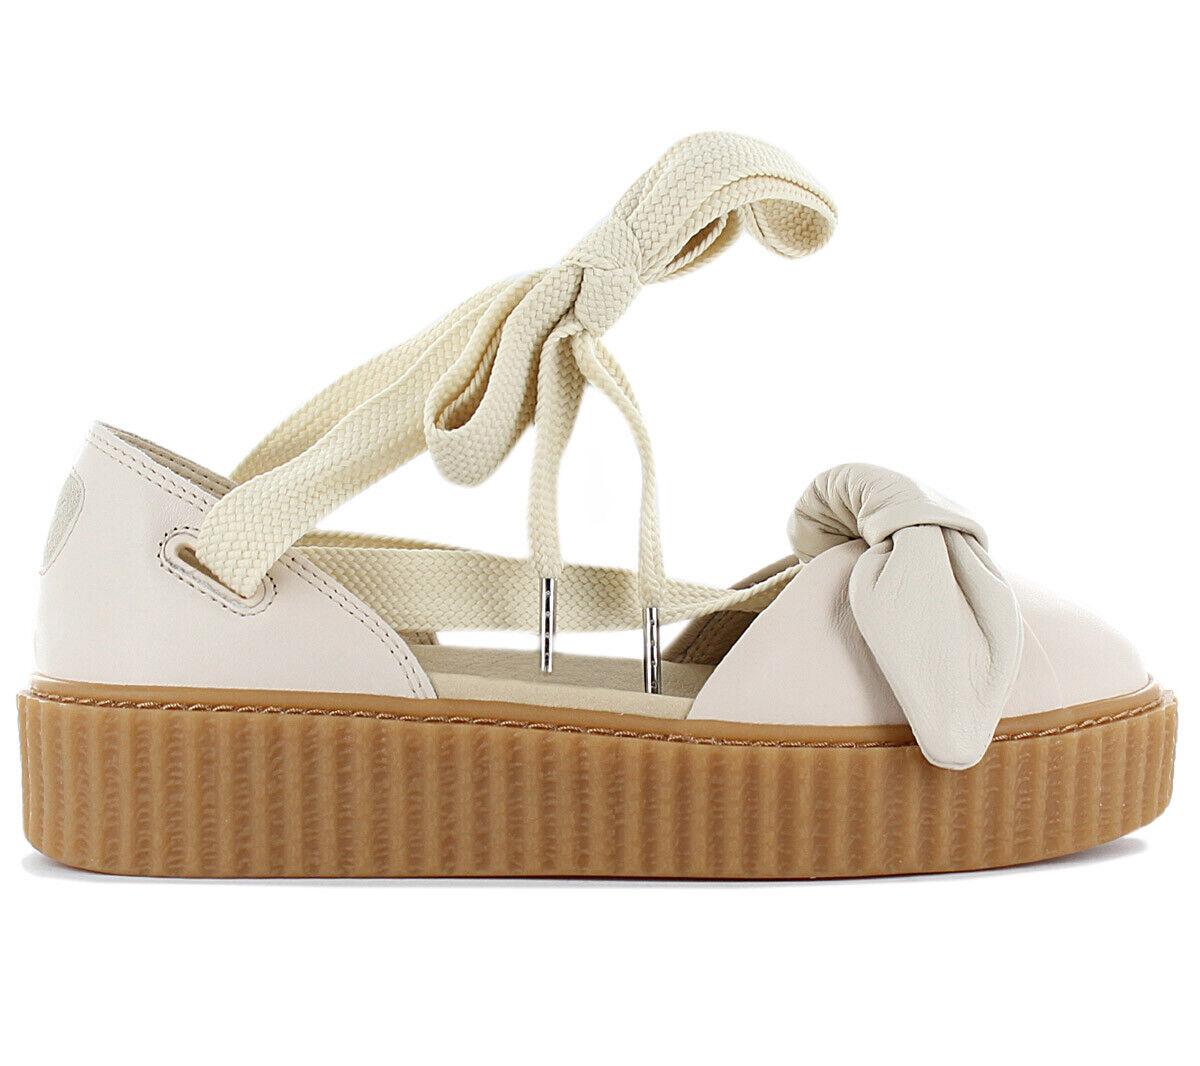 Fenty x PUMA by Rihanna Creeper Bow Donna Sandali 365794-02 Scarpe scarpe da ginnastica Nuovo